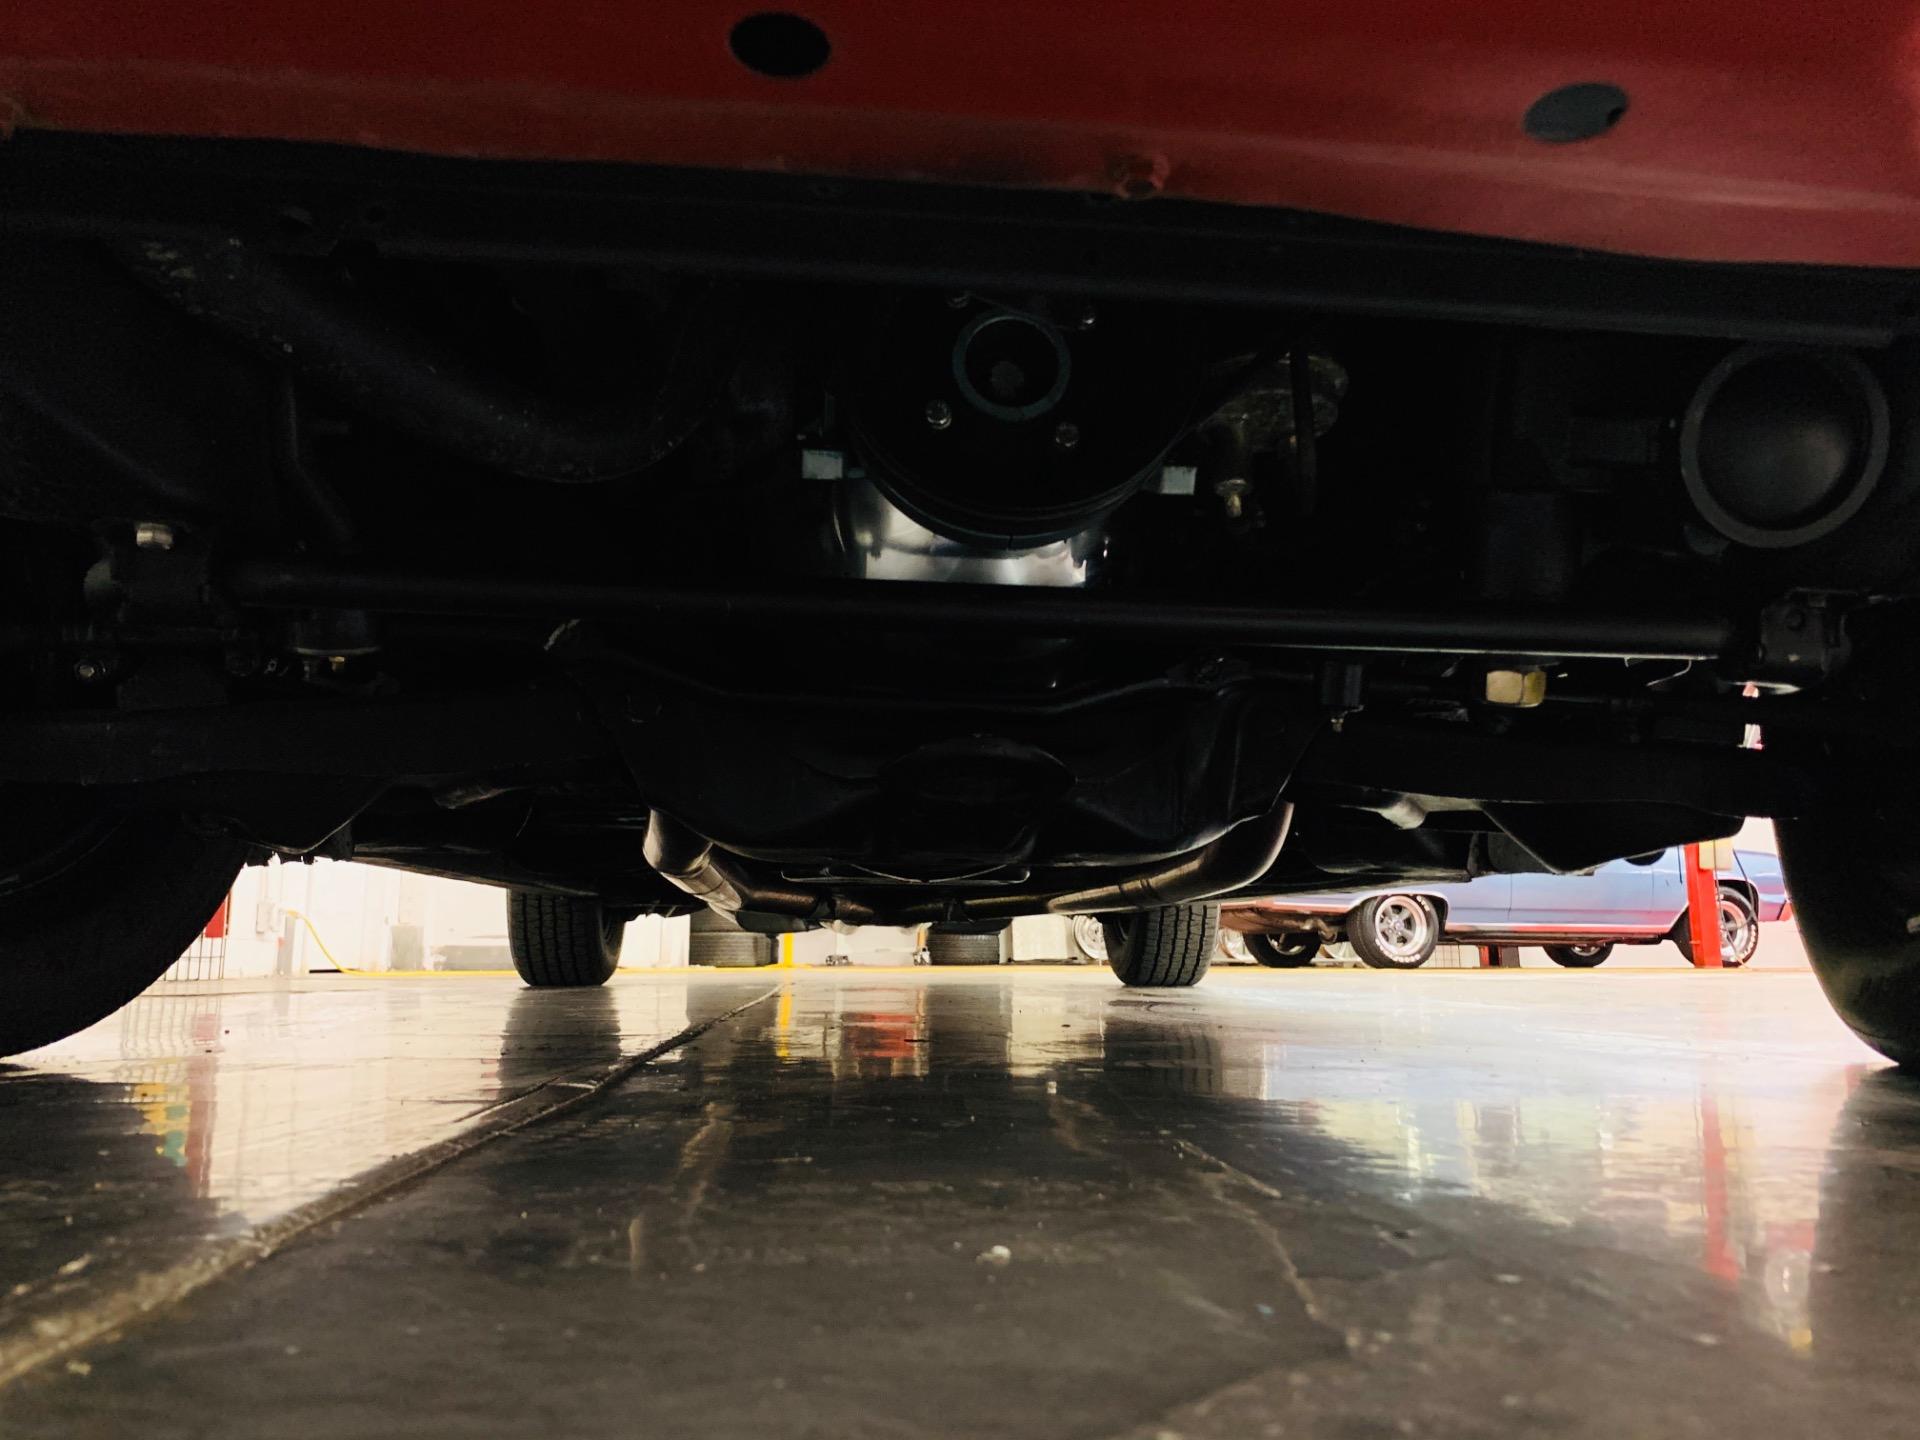 Used 1968 Pontiac GTO - 242 VIN - POWER CONVERTIBLE TOP - 428 ENGINE - | Mundelein, IL